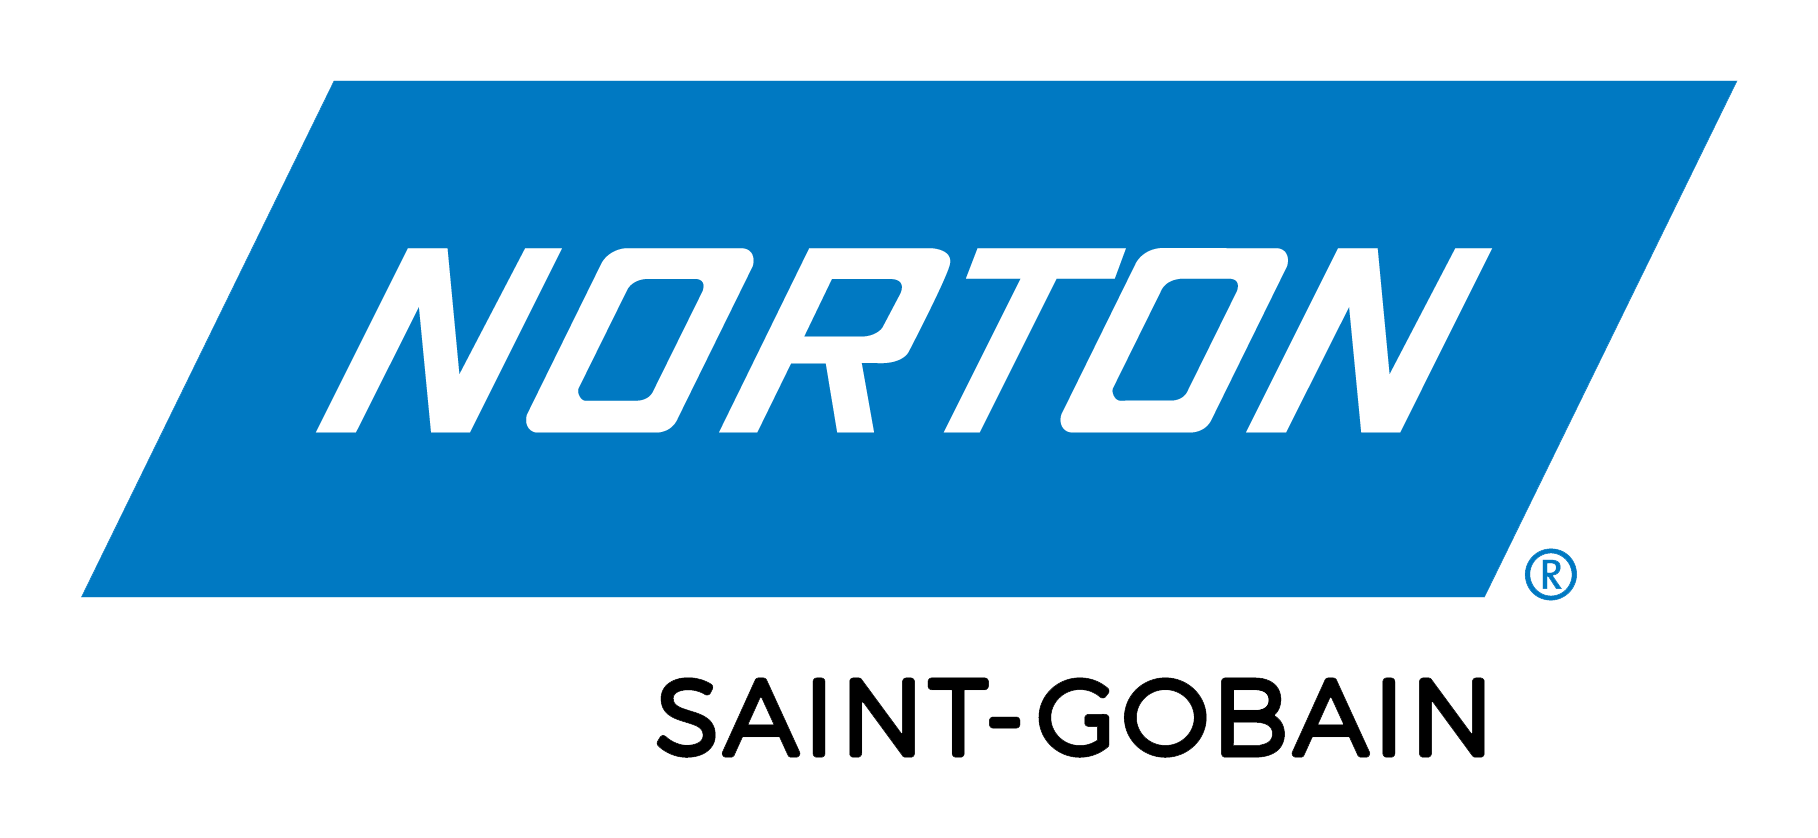 SG_Norton_logo_rgb_10